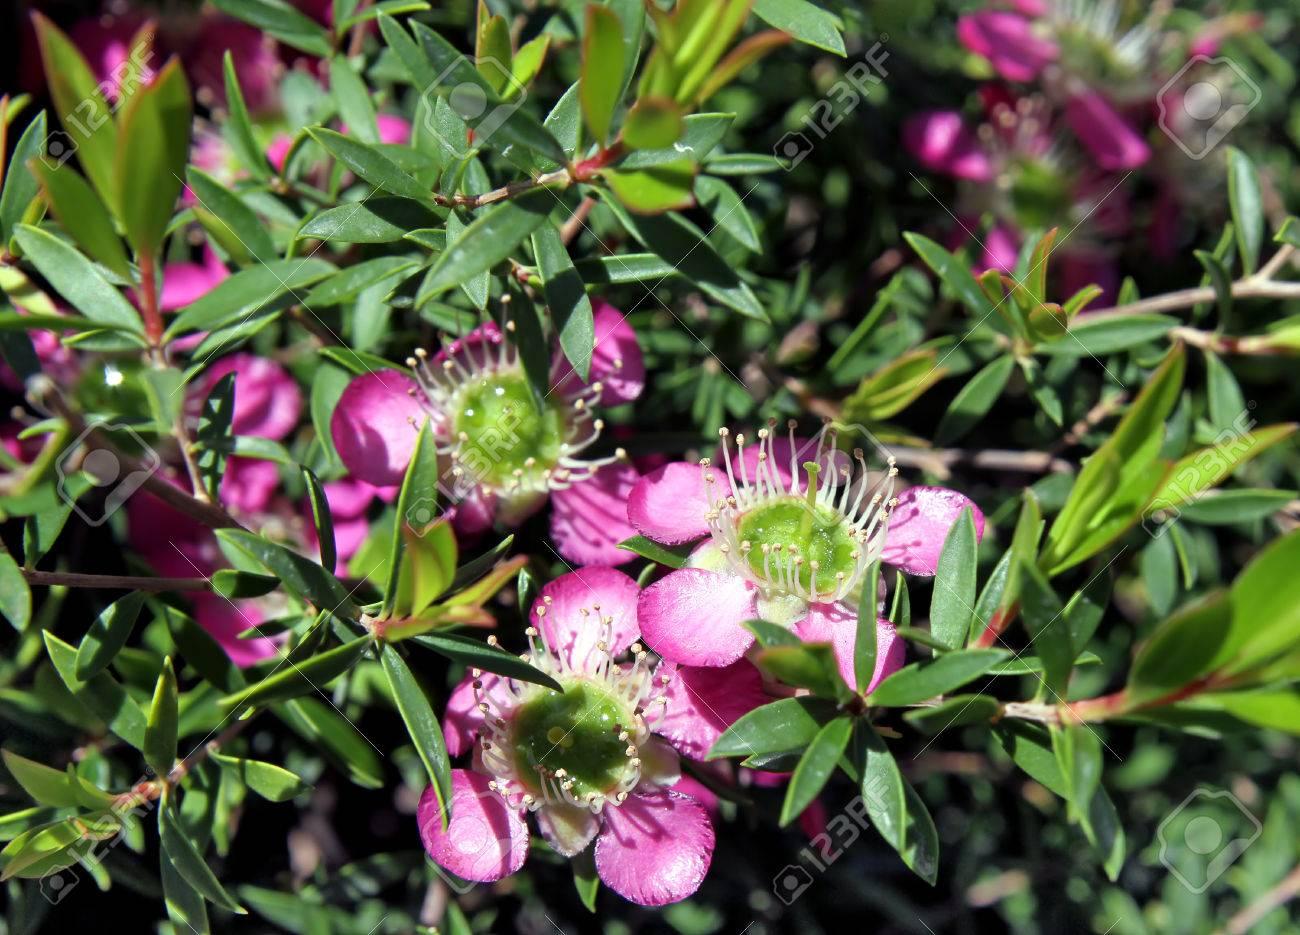 Ornamental evergreen shrub leptospermum blooming pink flowers stock ornamental evergreen shrub leptospermum blooming pink flowers stock photo 40268126 mightylinksfo